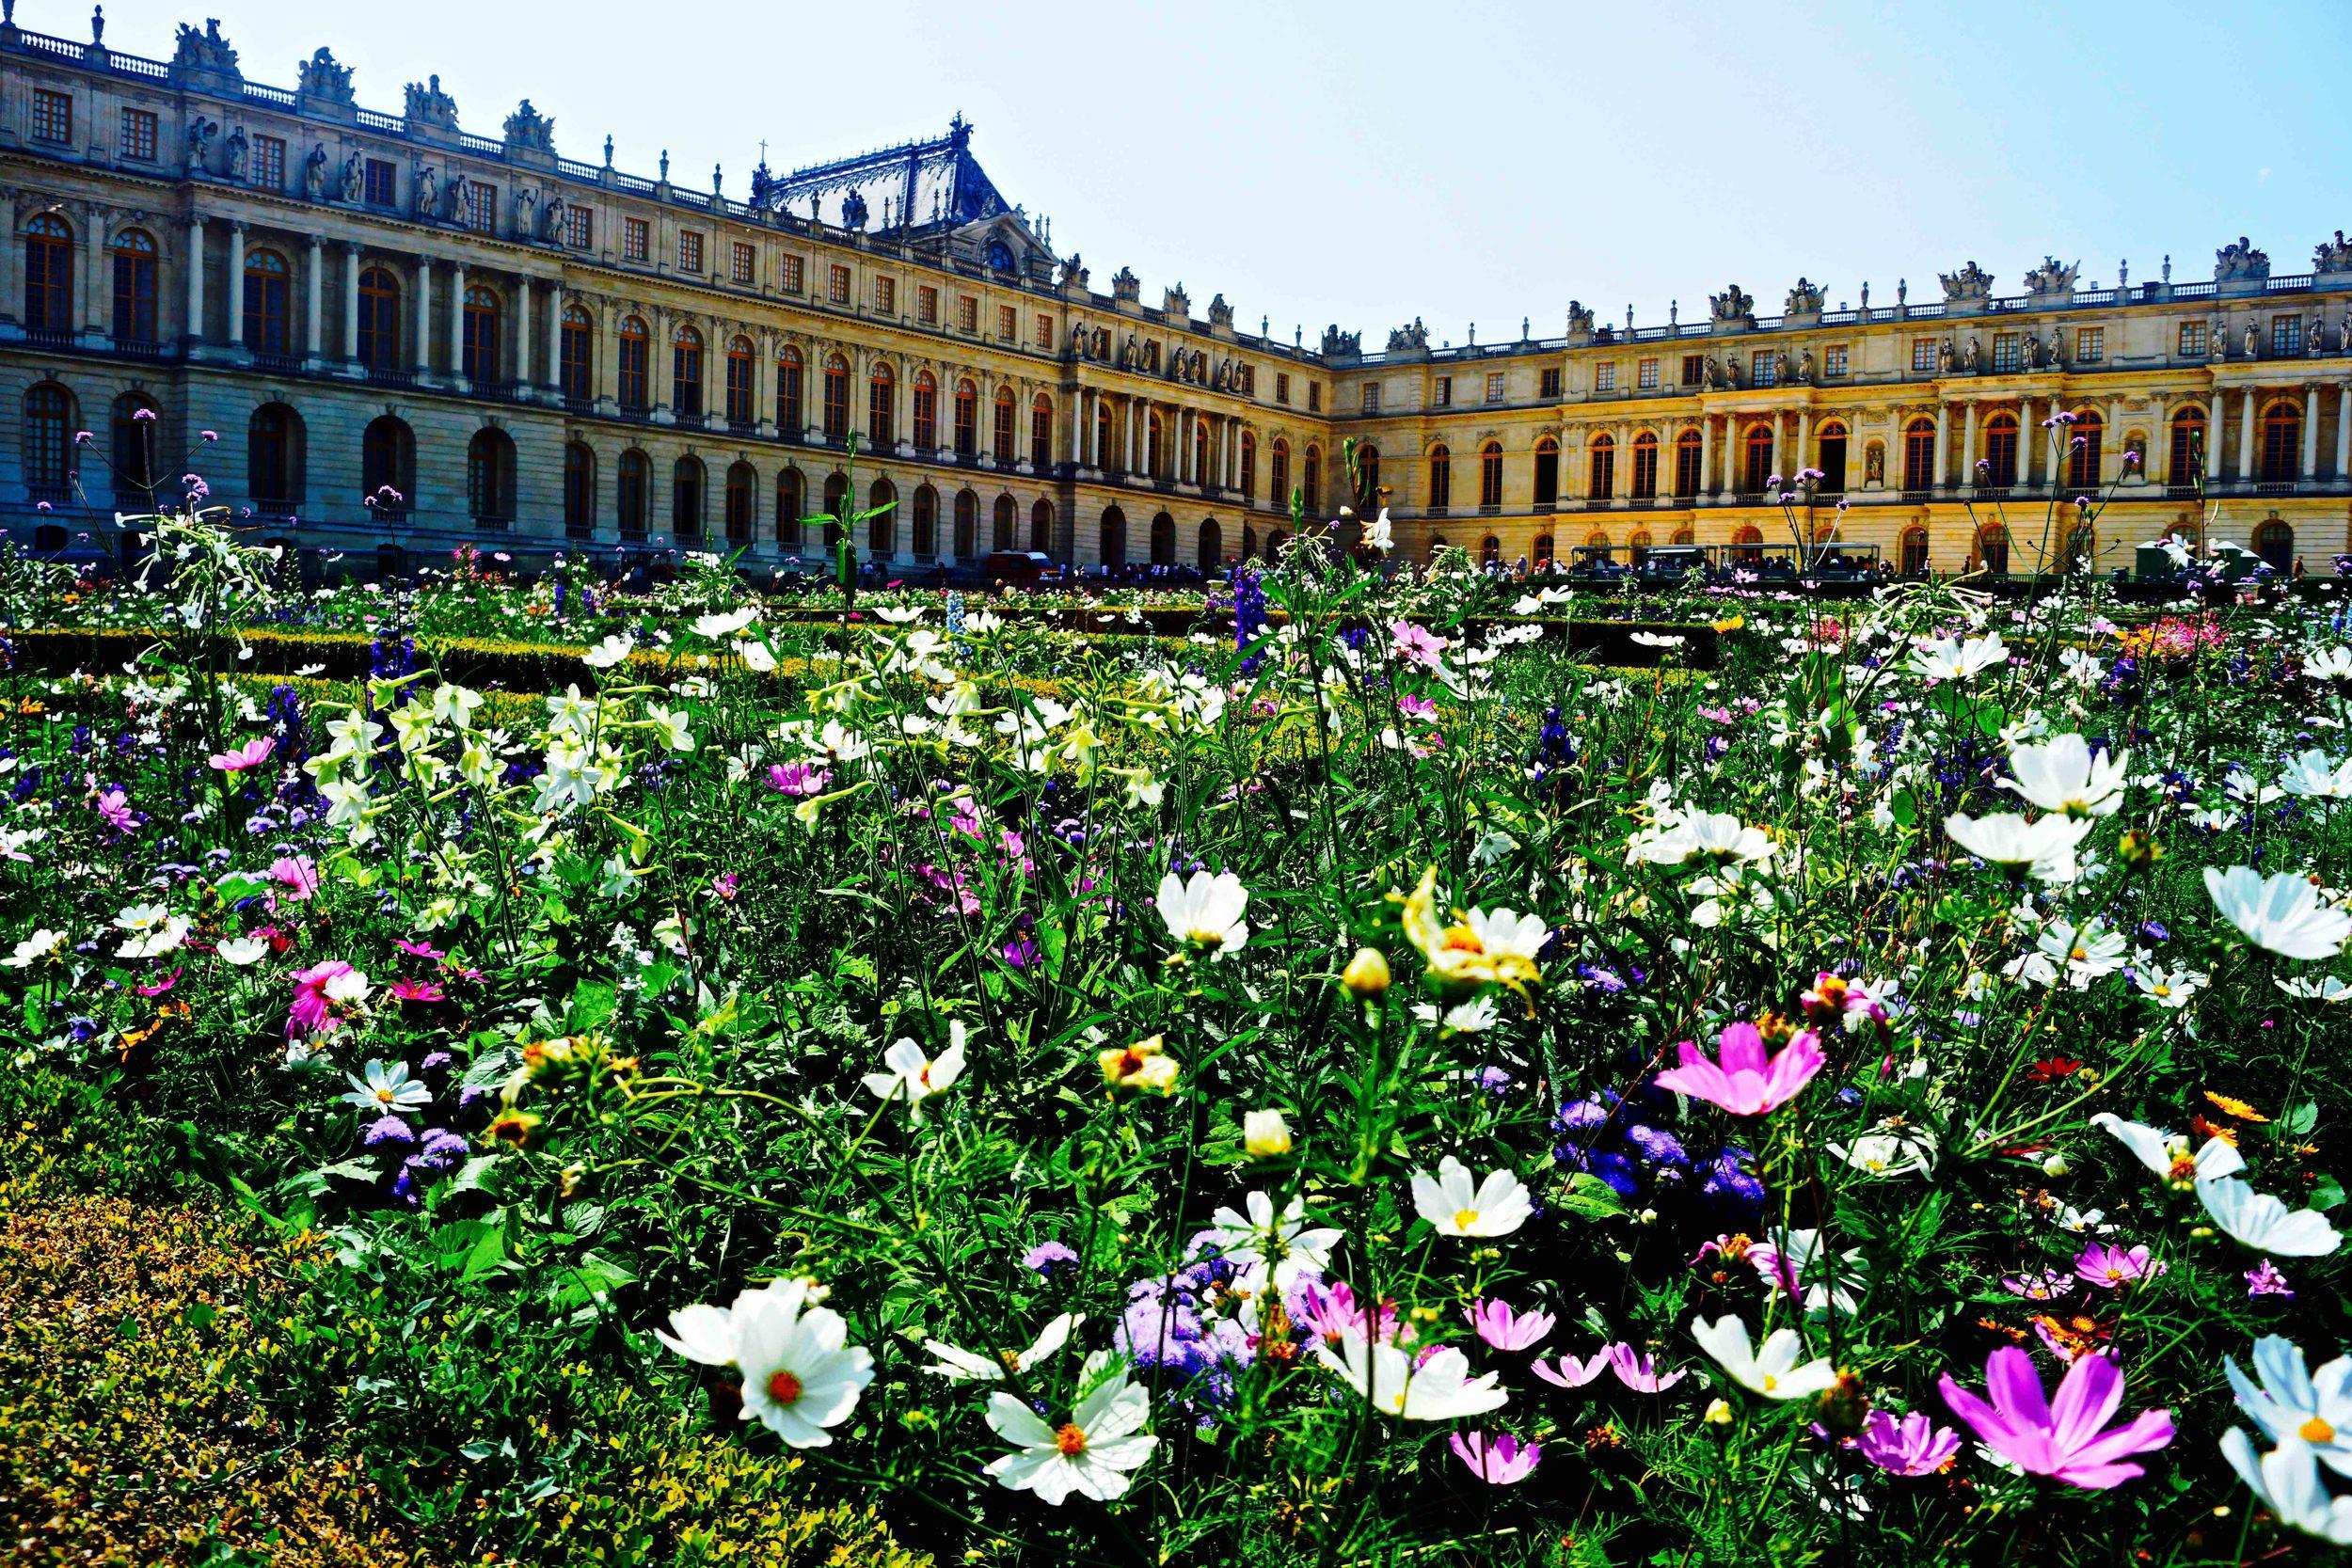 Versailles, France, July 2015